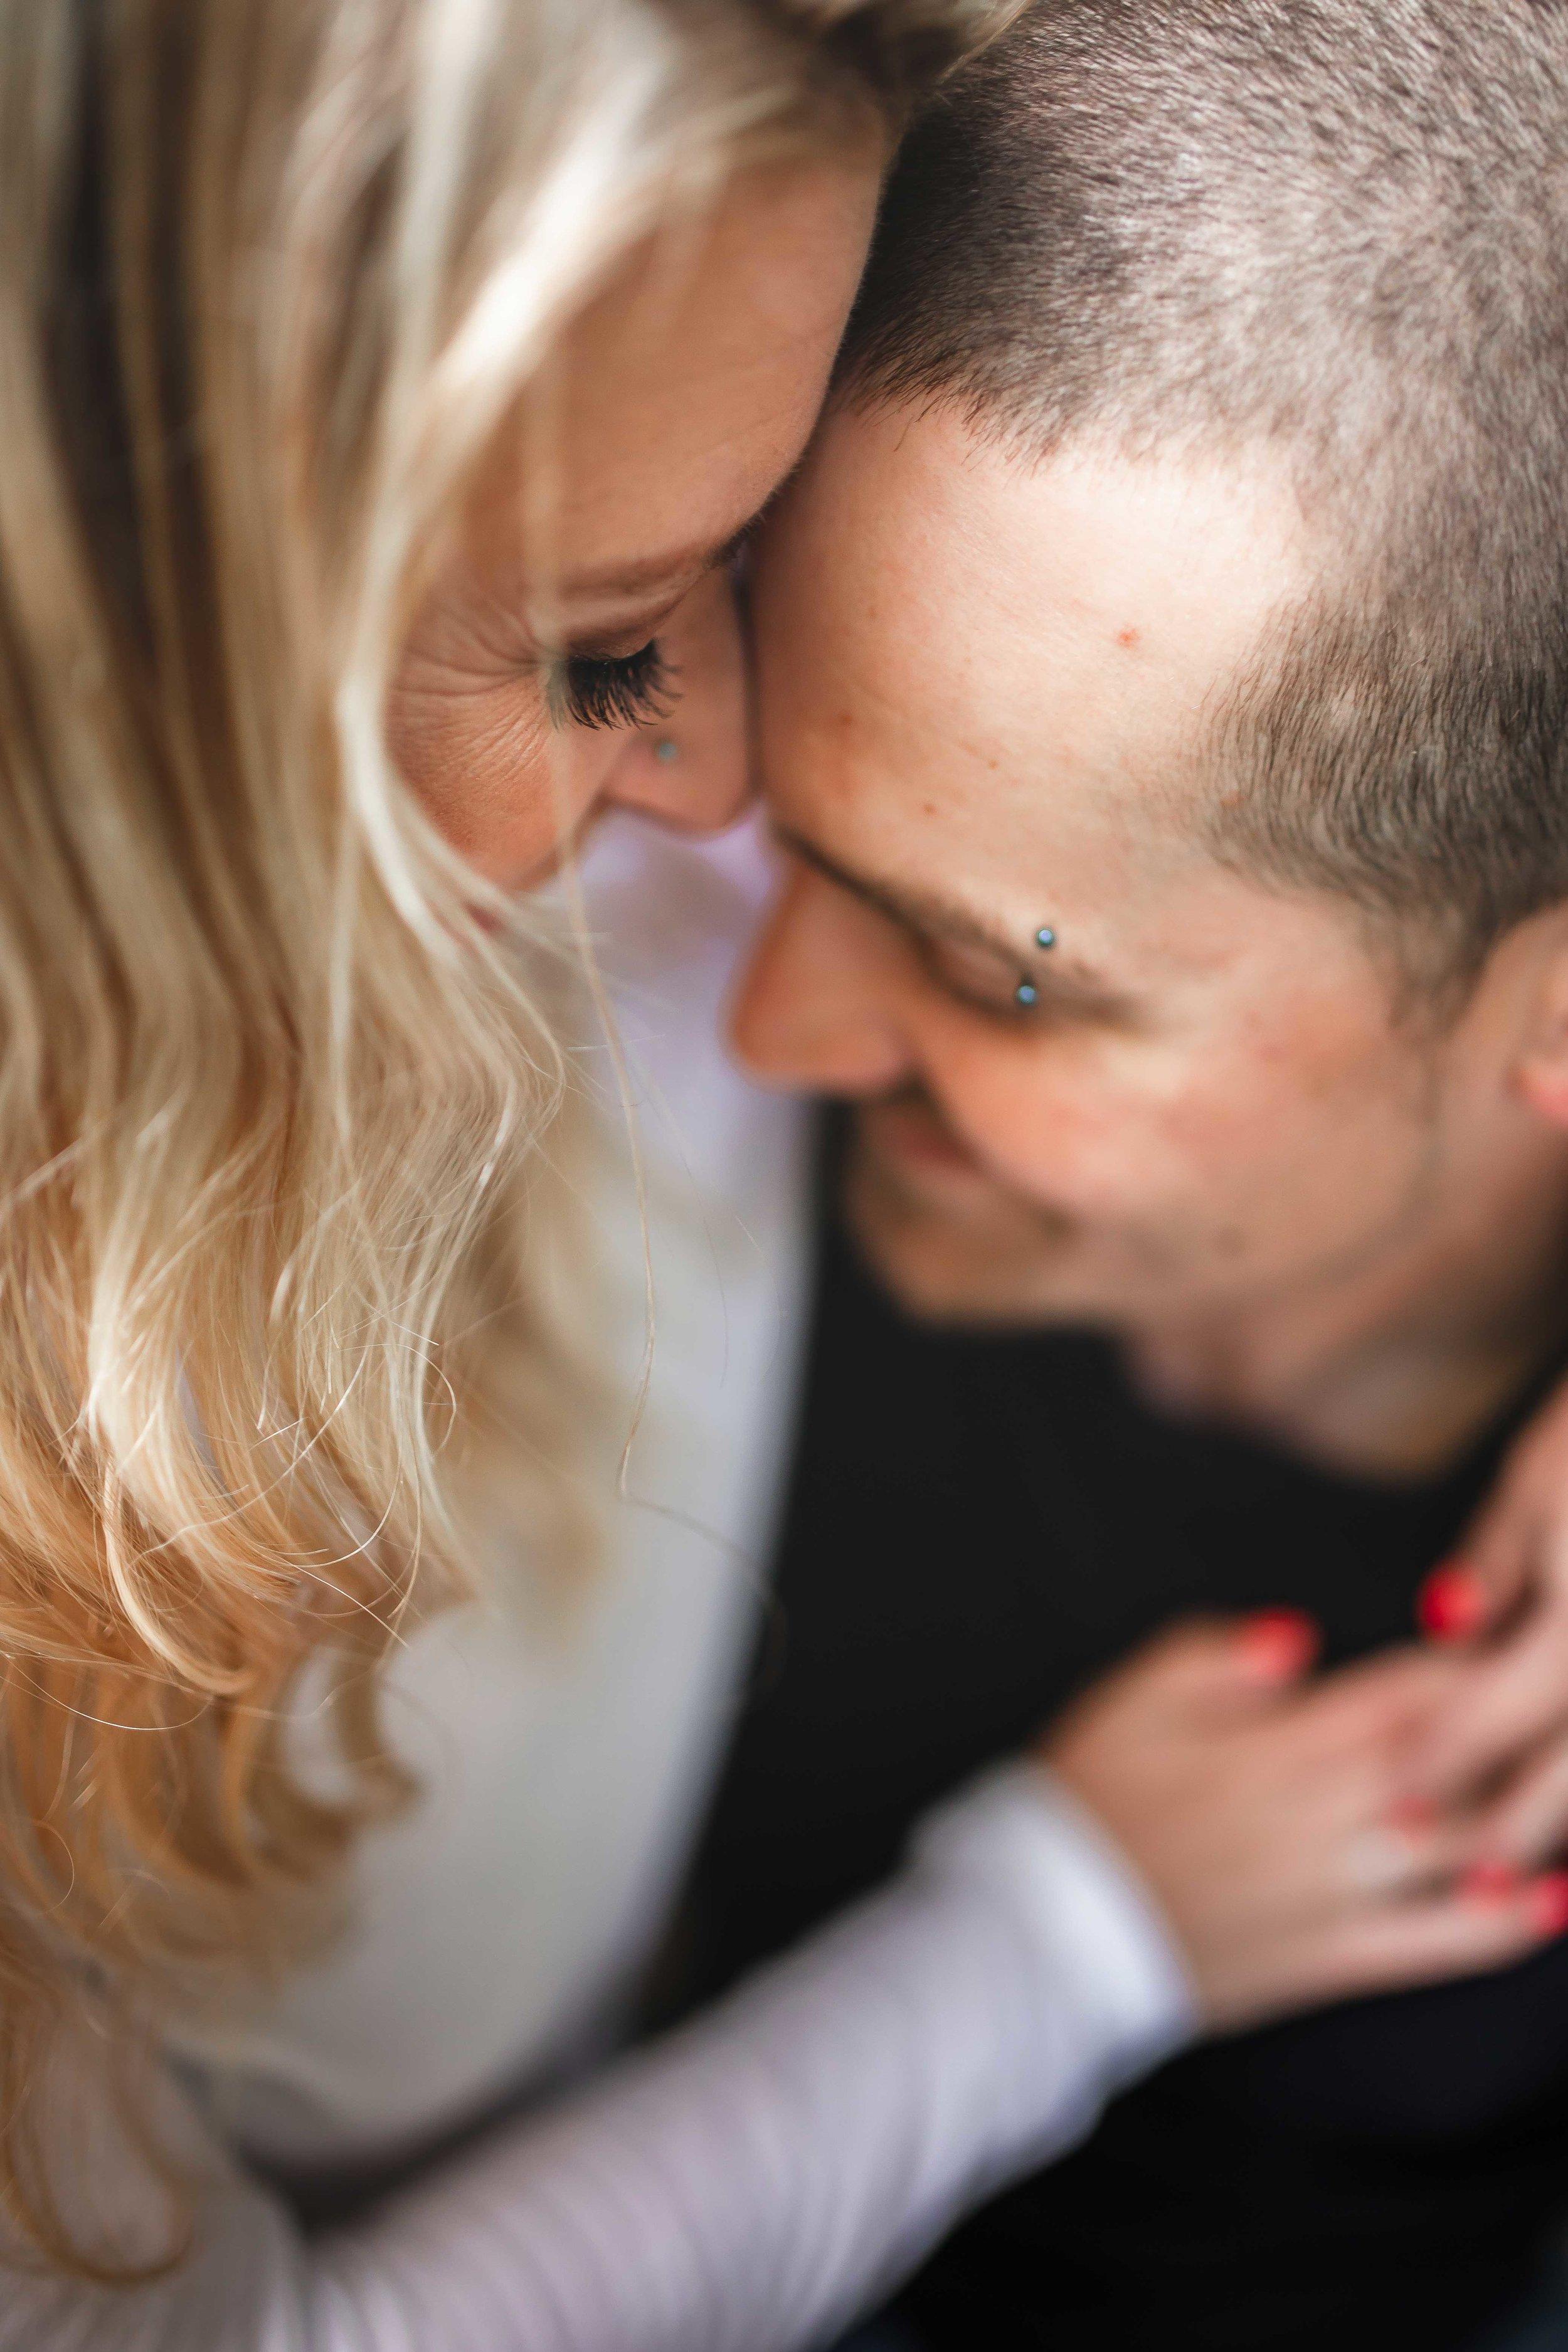 Amy-D-Photography--Wedding-Photography--Barrie-Wedding-Photography--Engagement-Session---Engagement-Pose-95.jpg